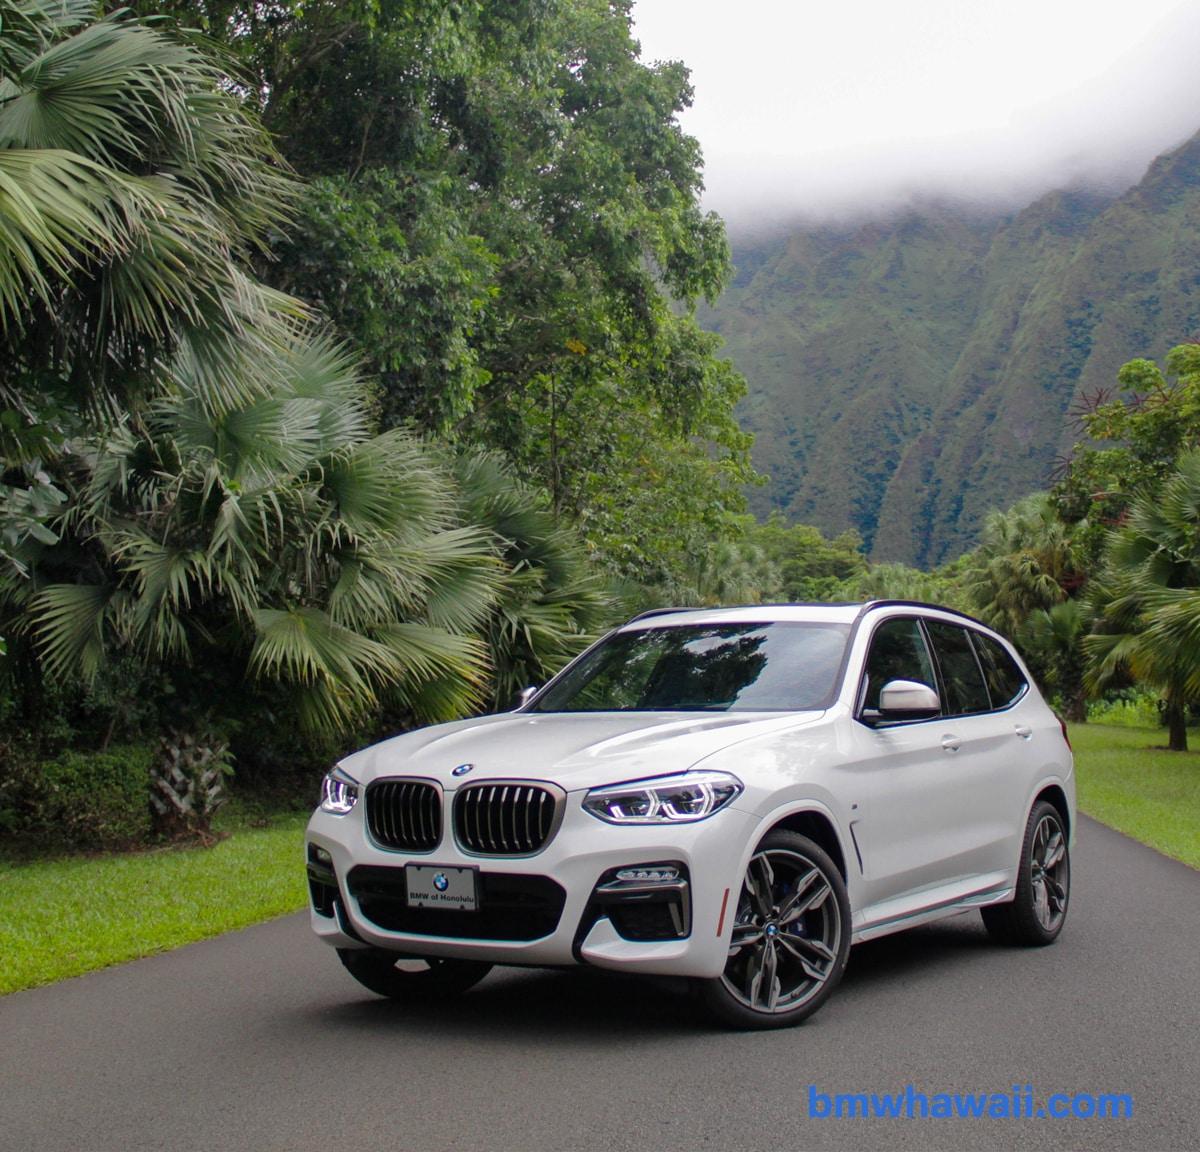 BMW Of Maui Fall Savings